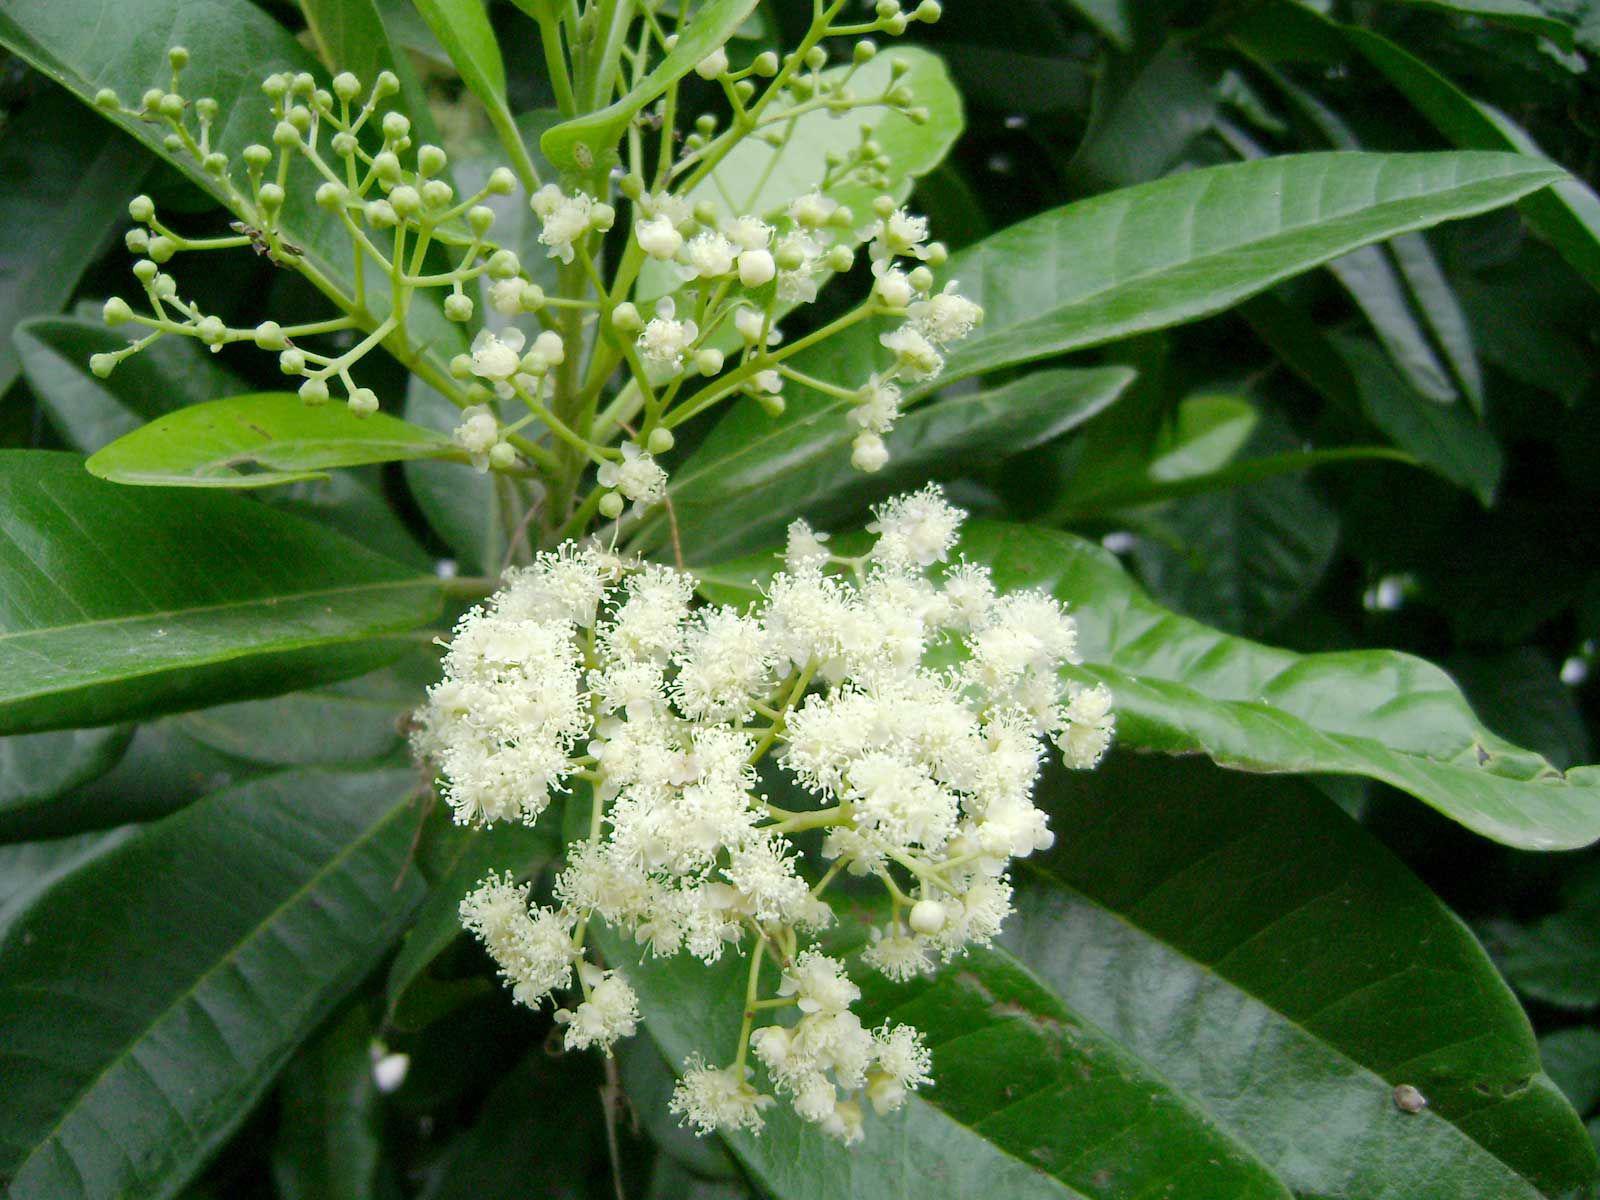 Allspice-close-up-flower